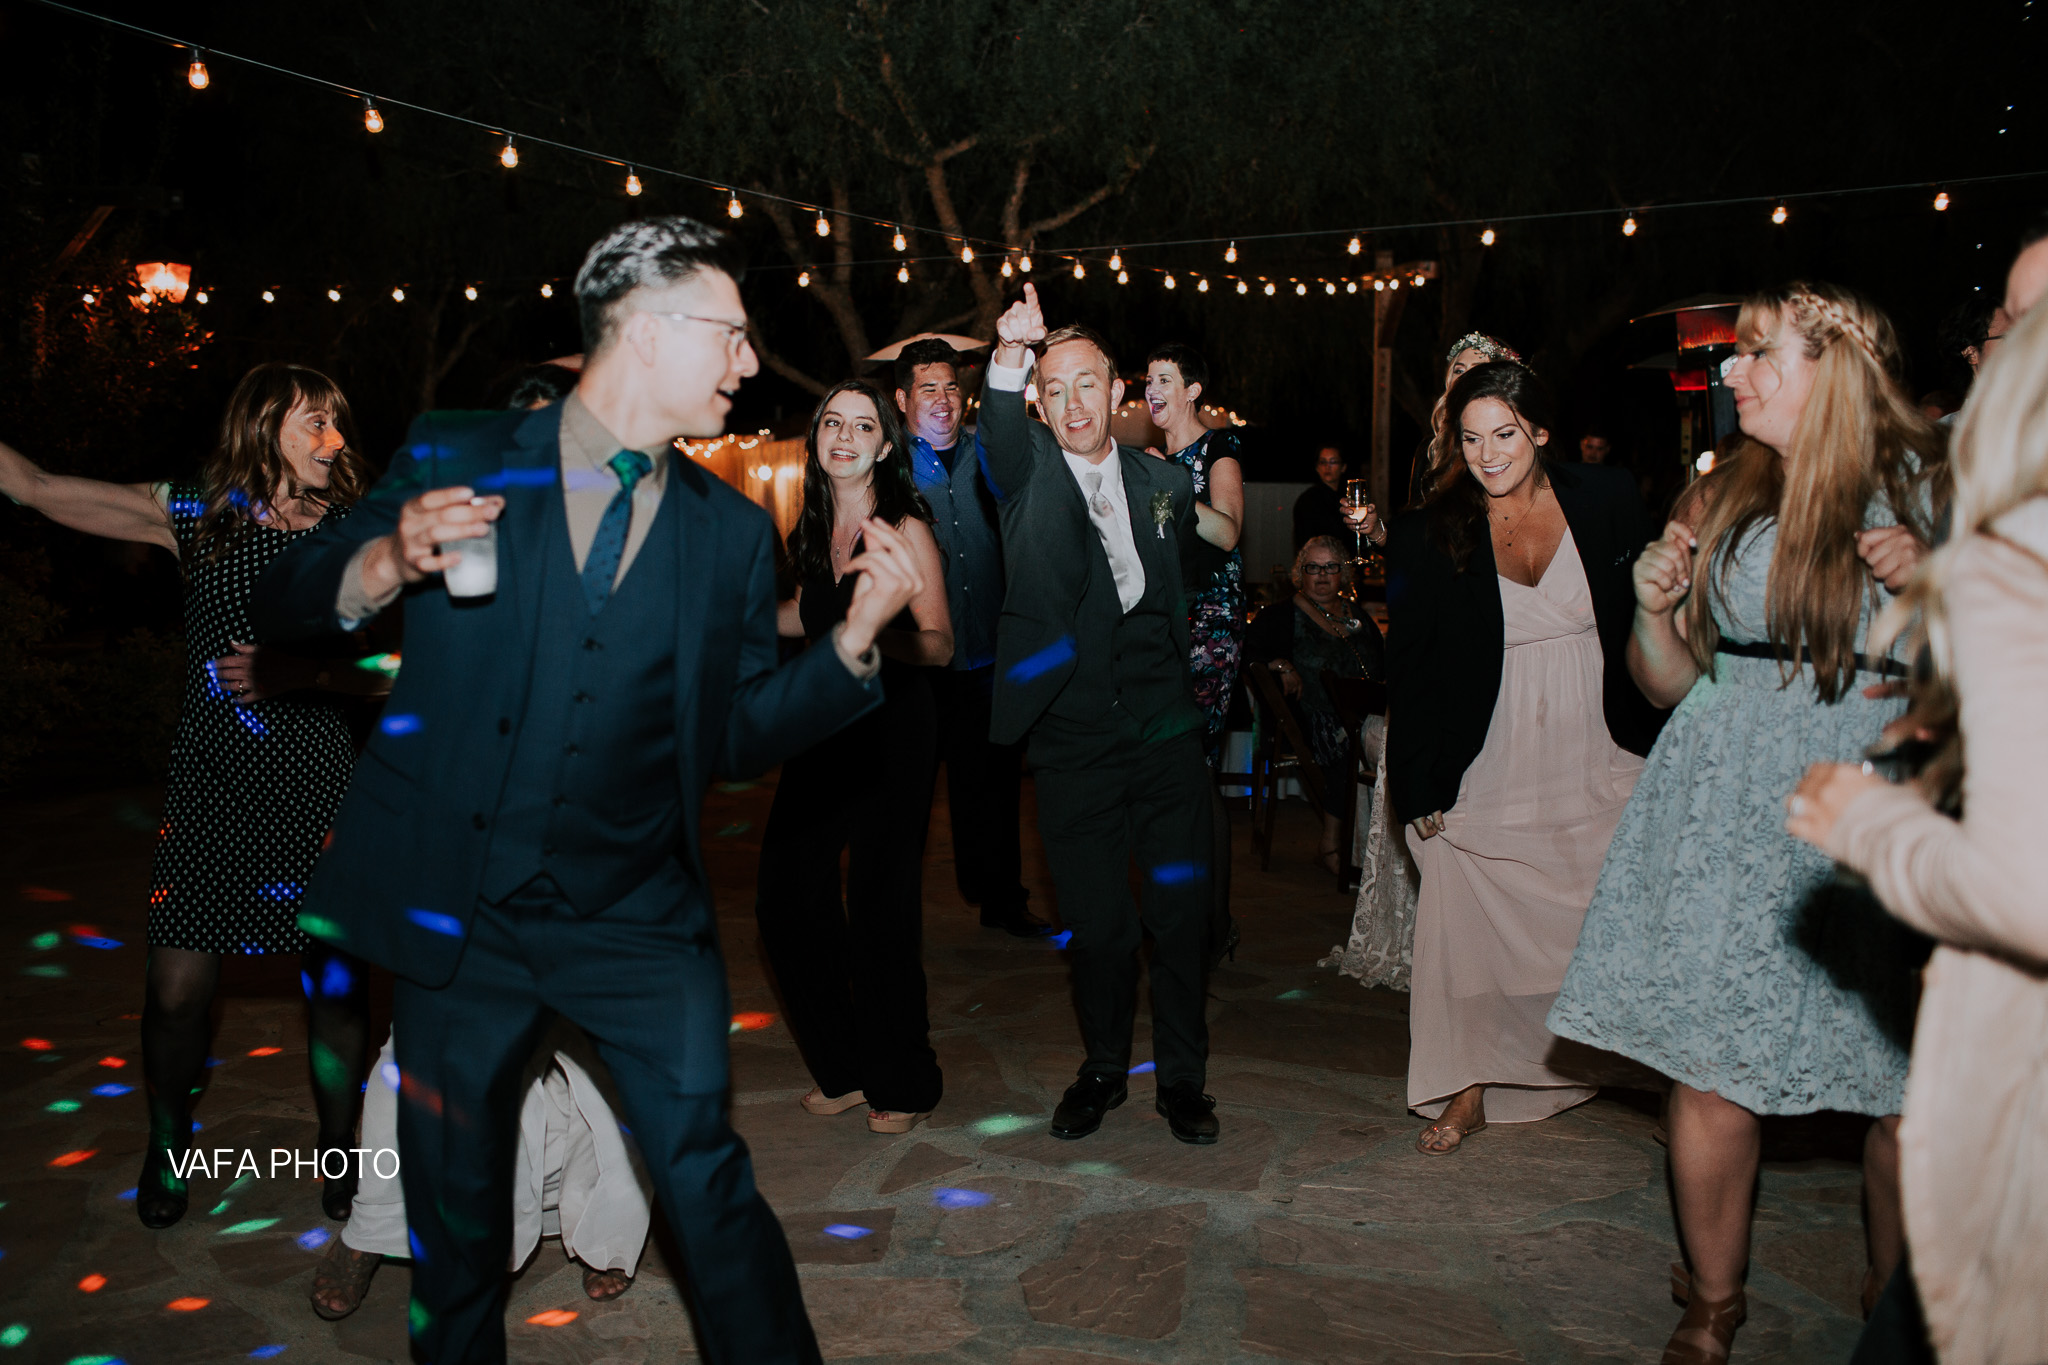 Leo-Carrillo-Ranch-Wedding-Lauren-Mike-Vafa-Photo-1186.jpg